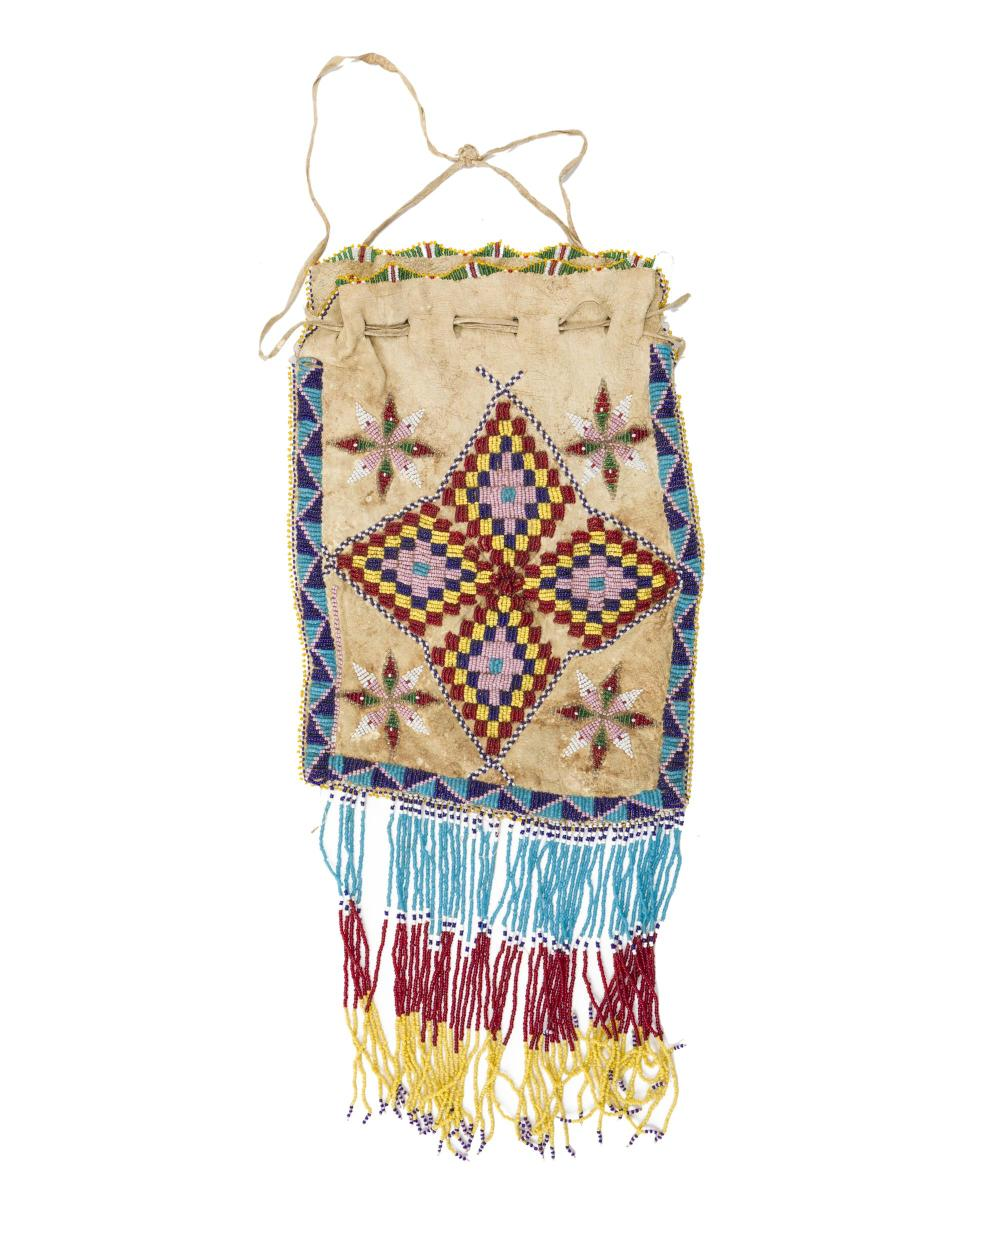 A Plains Indian beaded amulet bag